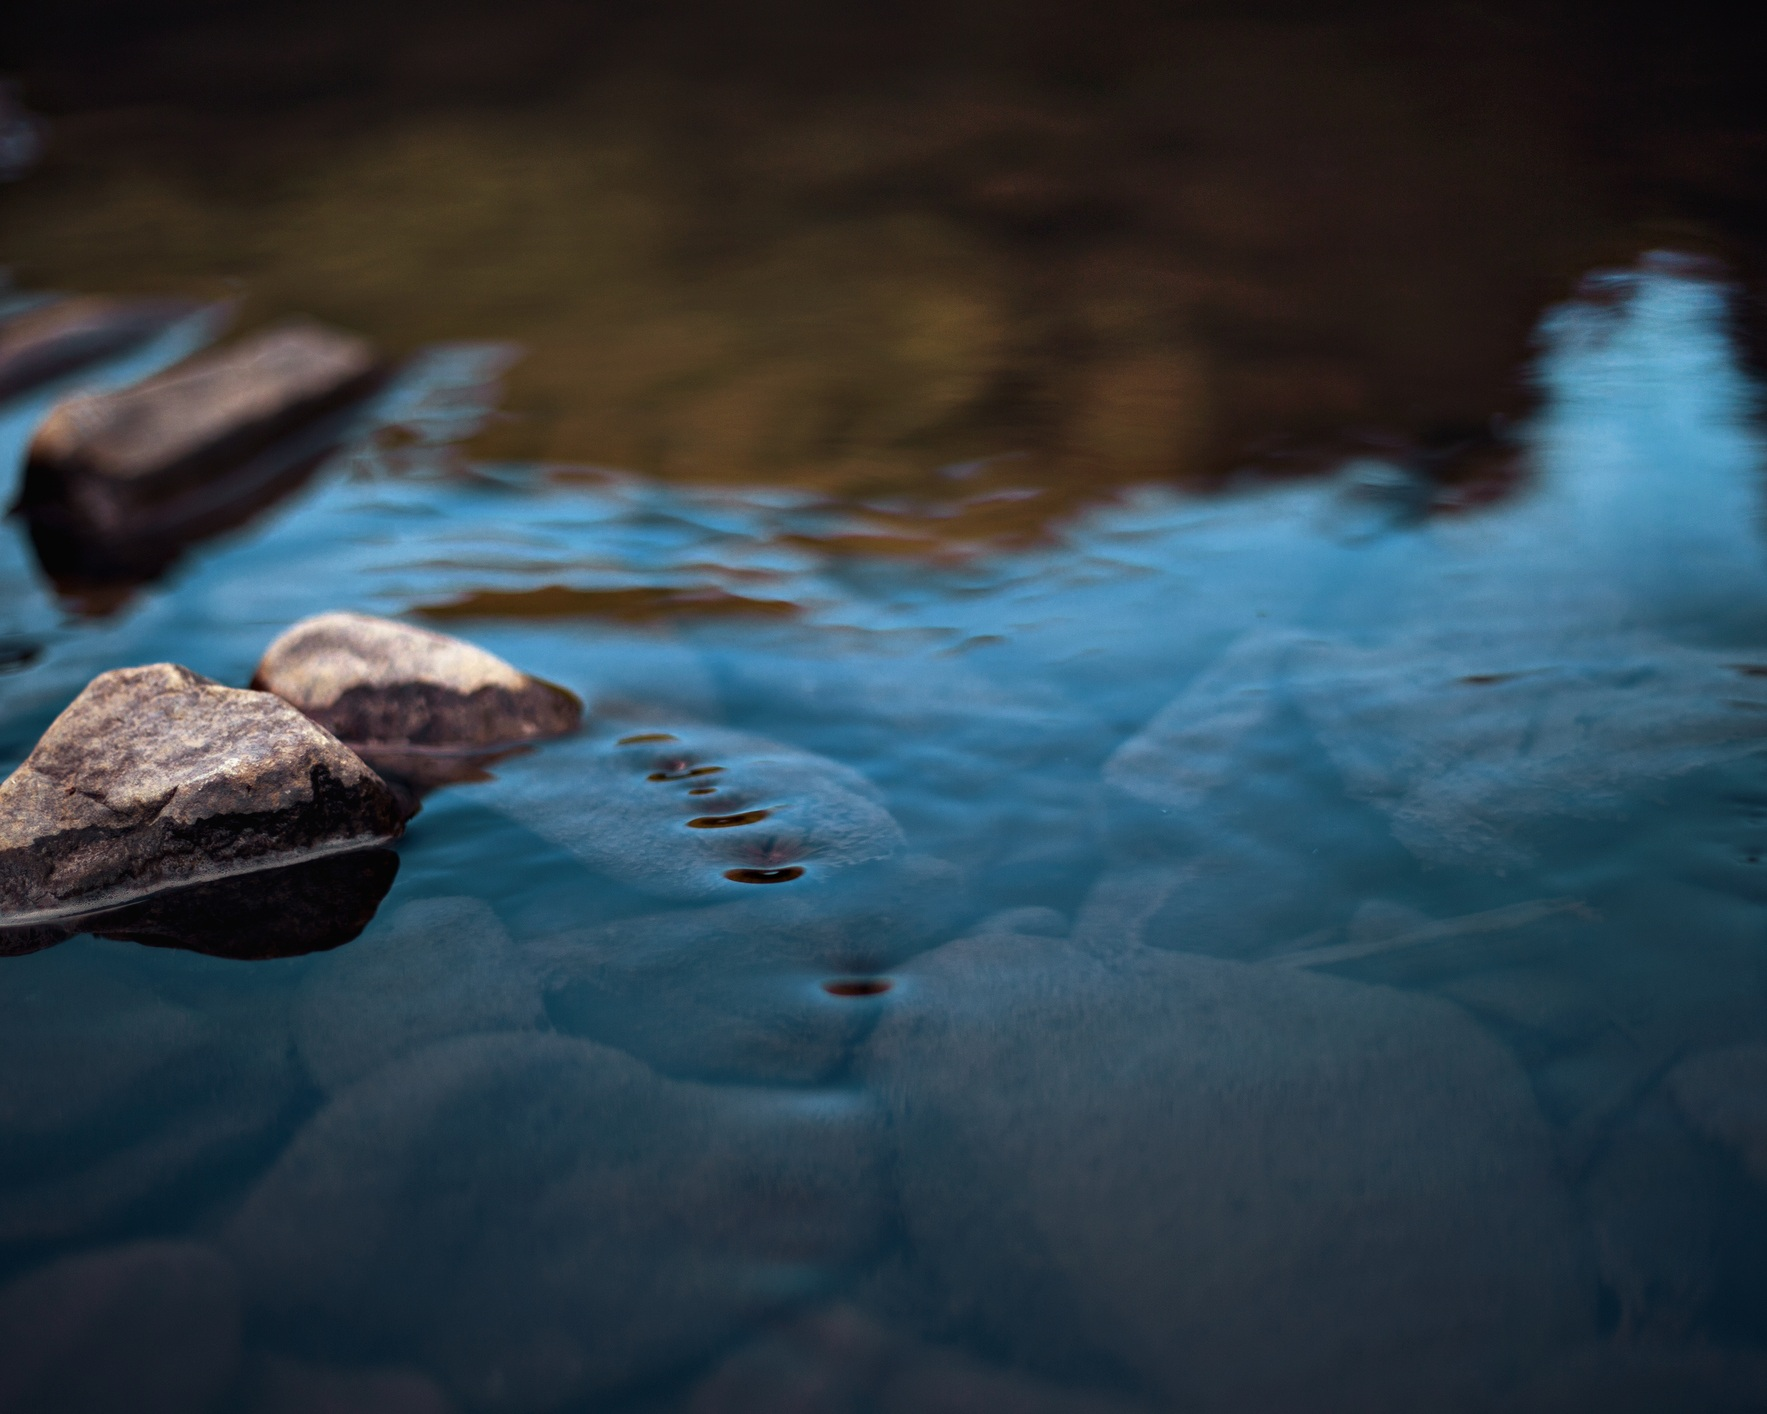 American Rivers - Washington, 2016Reconnecting Streams to Floodplains to Enhance Adaptive Capacity of Upper Yakima Ecosystems